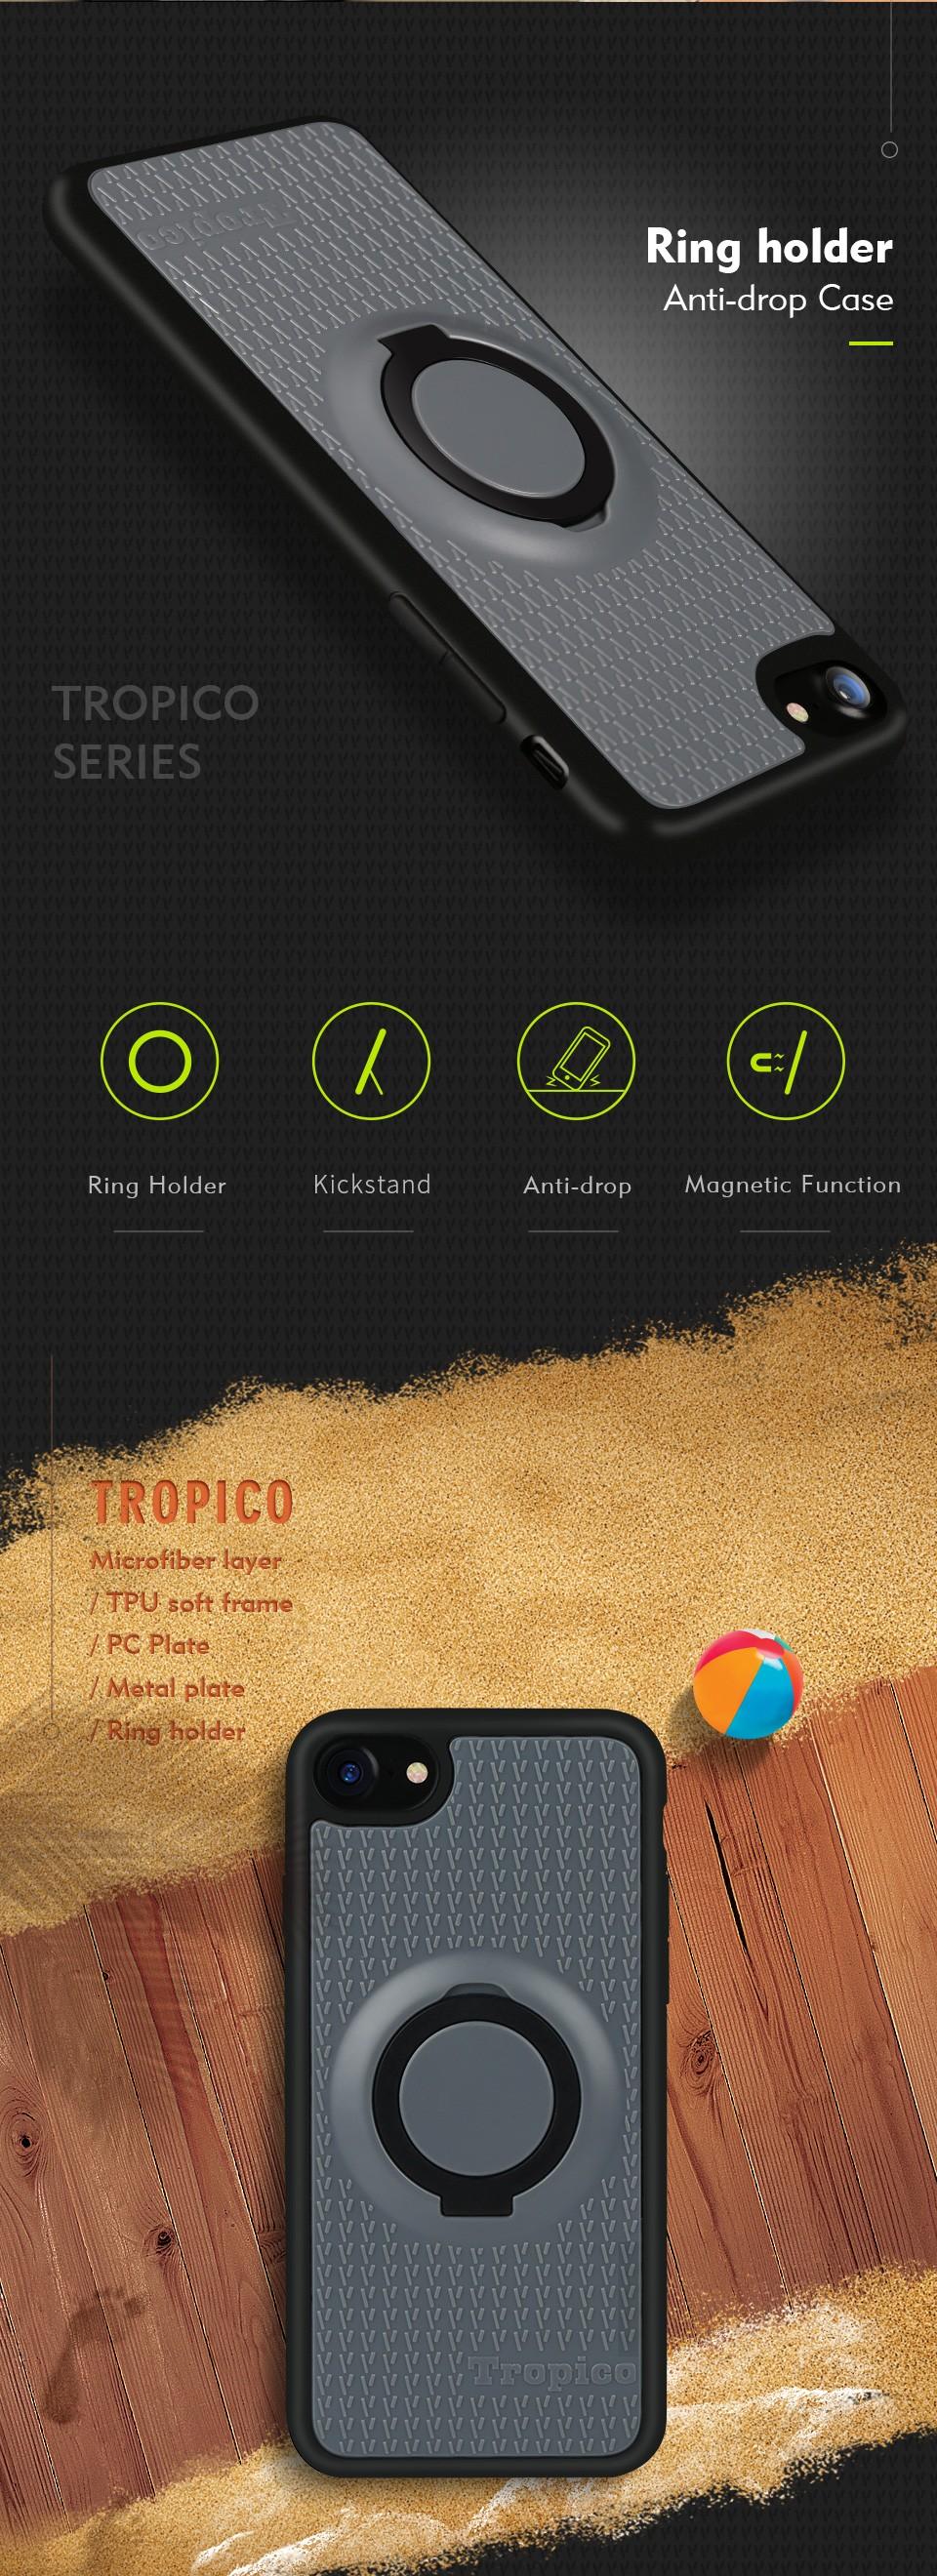 TROPICO-SERIES-7--960_02